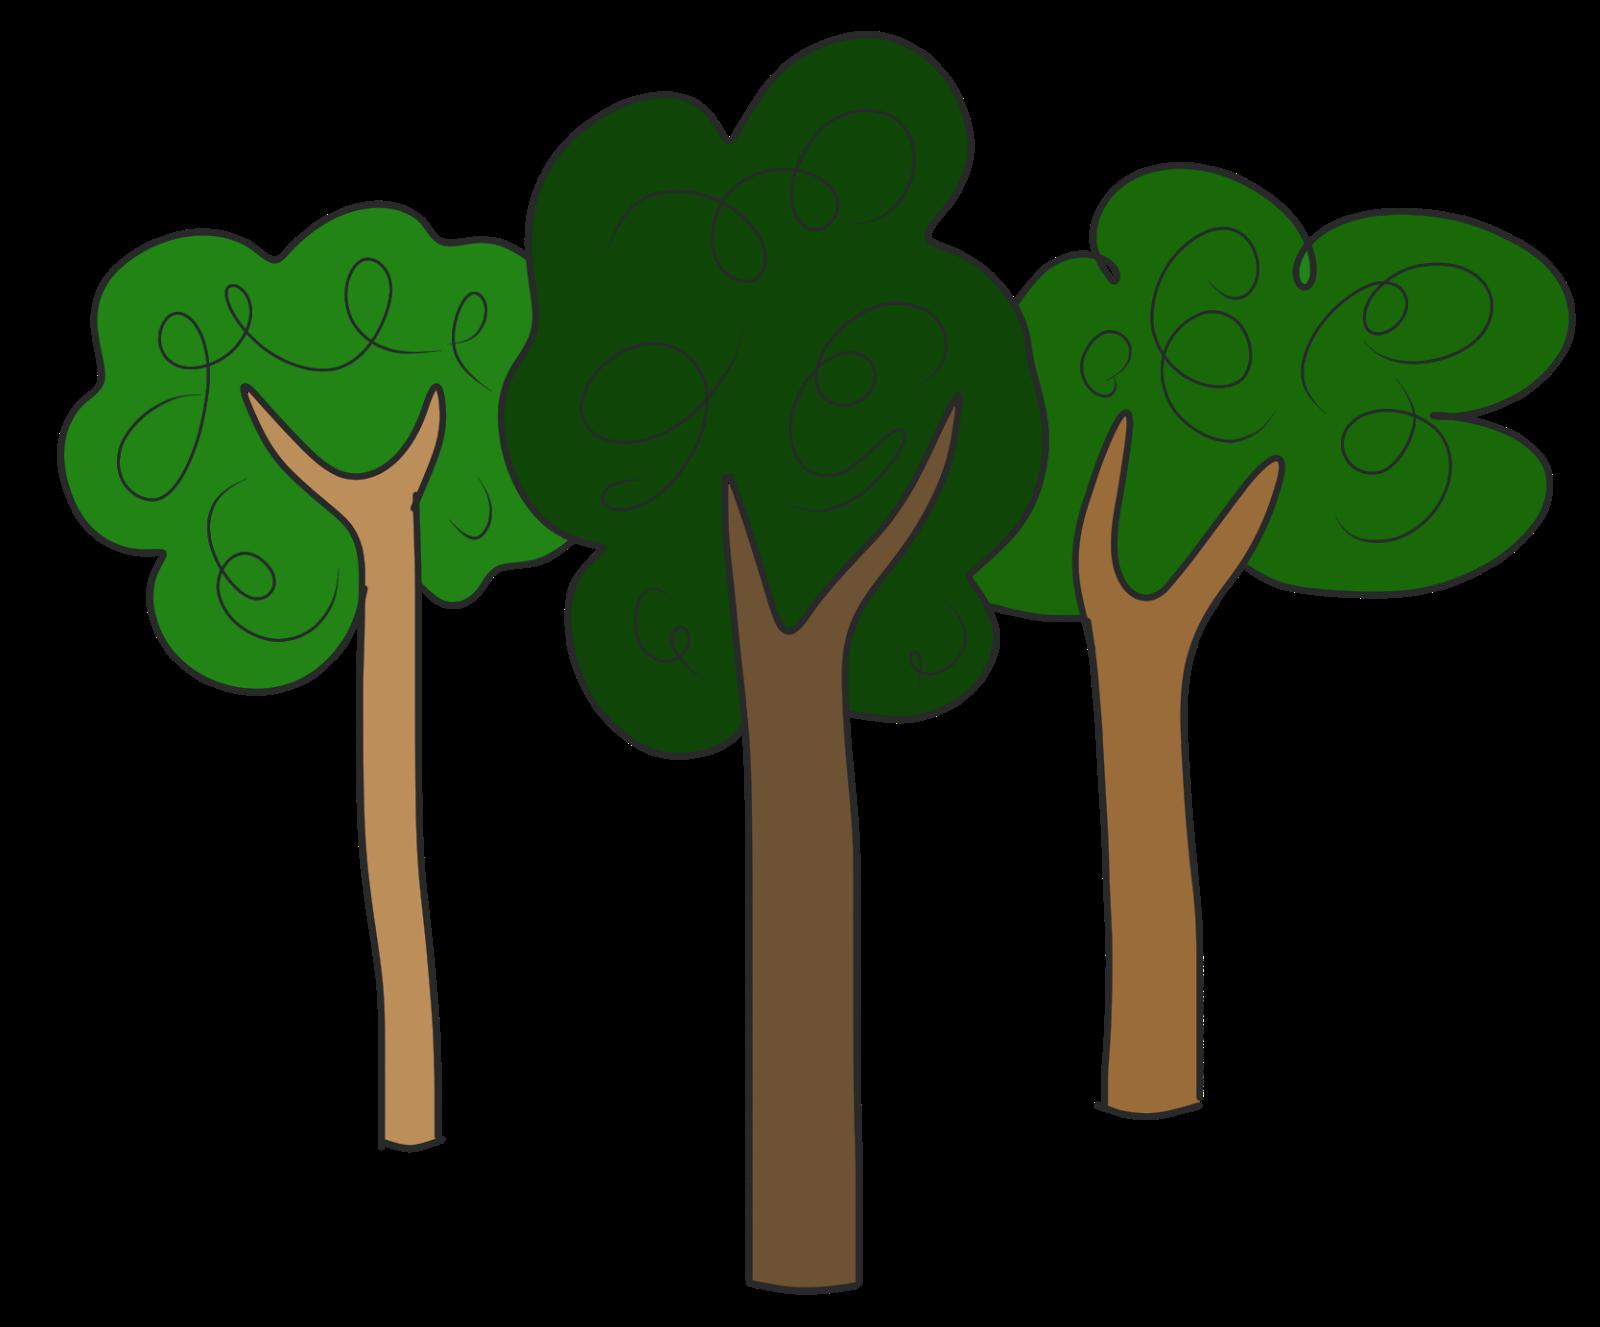 Trees simple tree clip art at